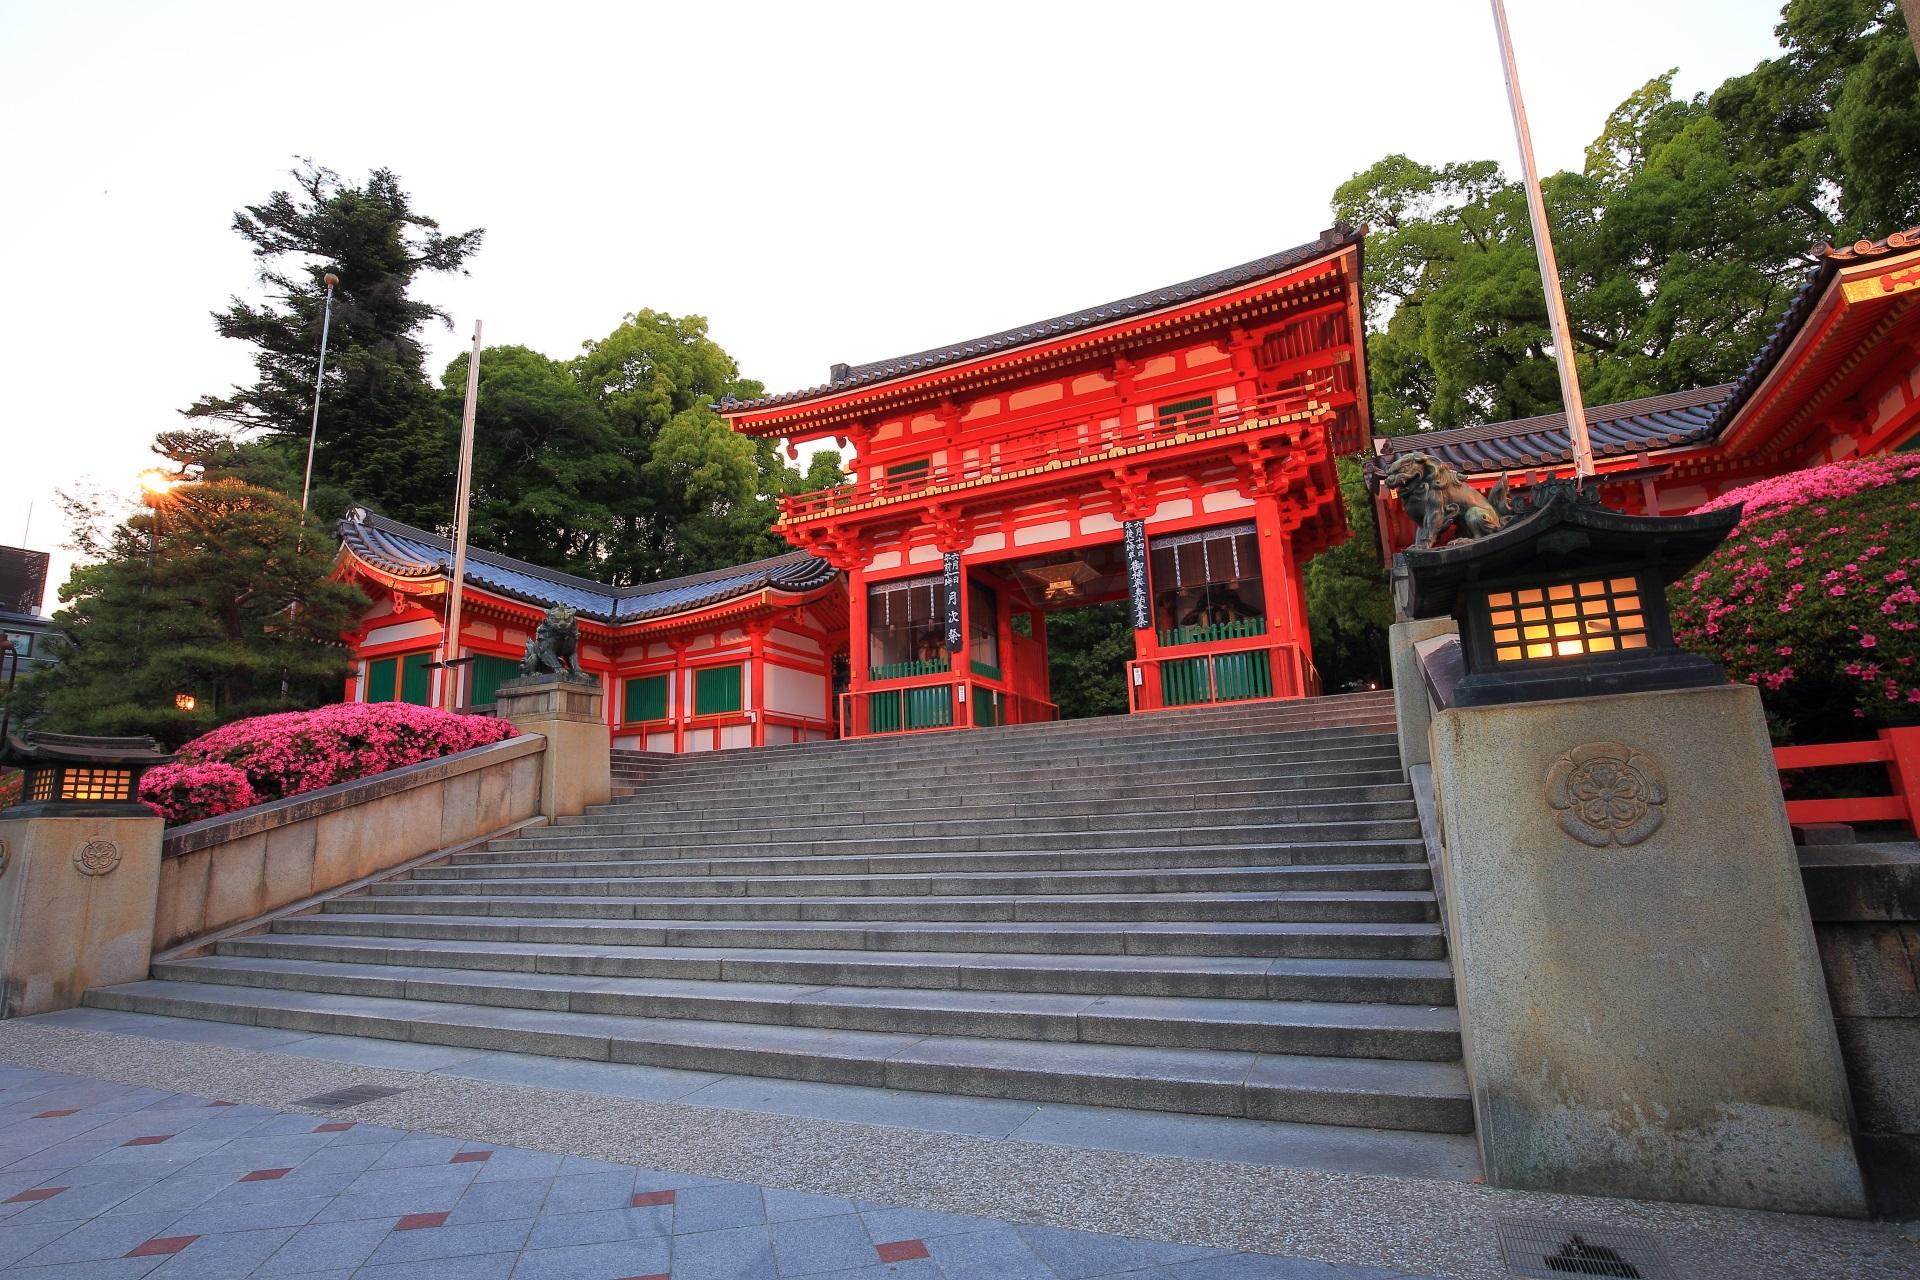 Kyoto Yasaka-jinja Shrine azalea